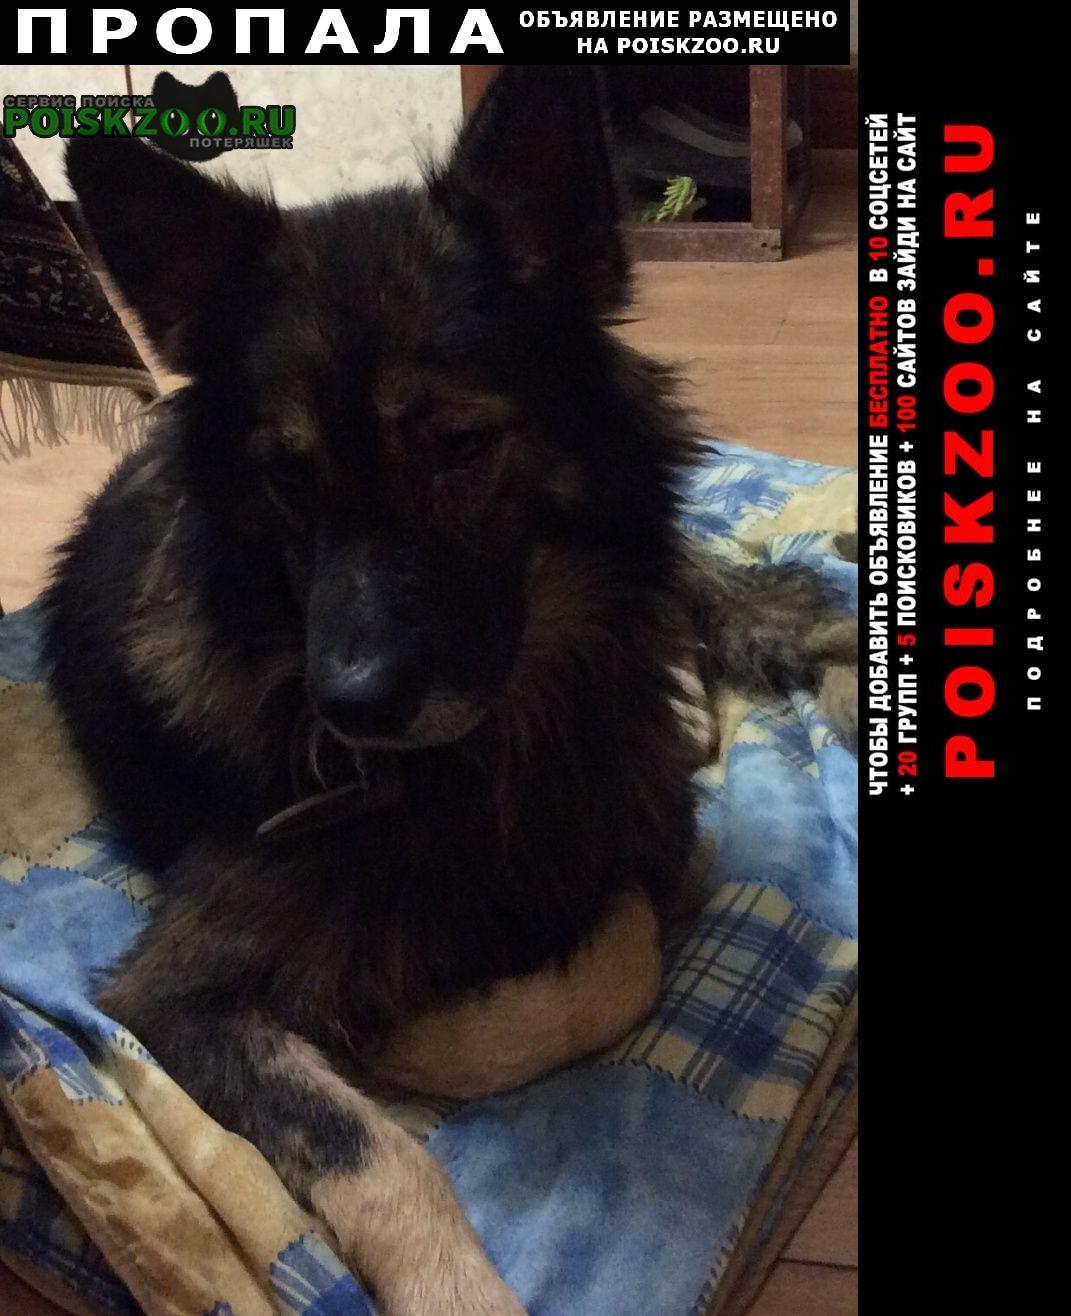 Пропала собака кобель Коммунар